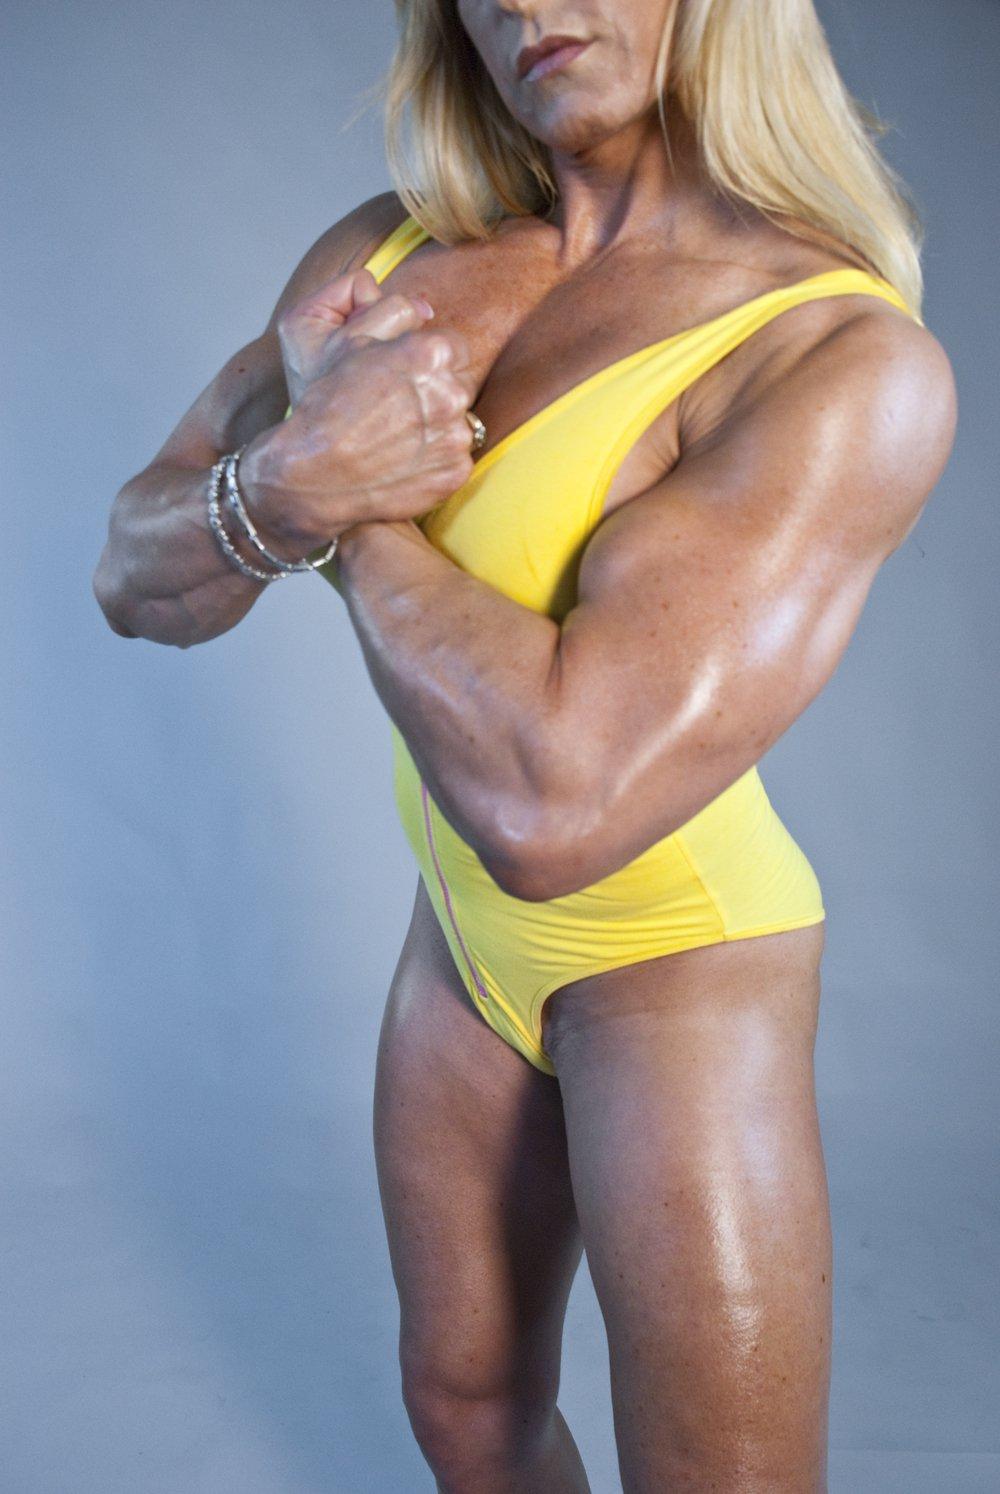 bikini gangbang spanking orgy Asian muscle